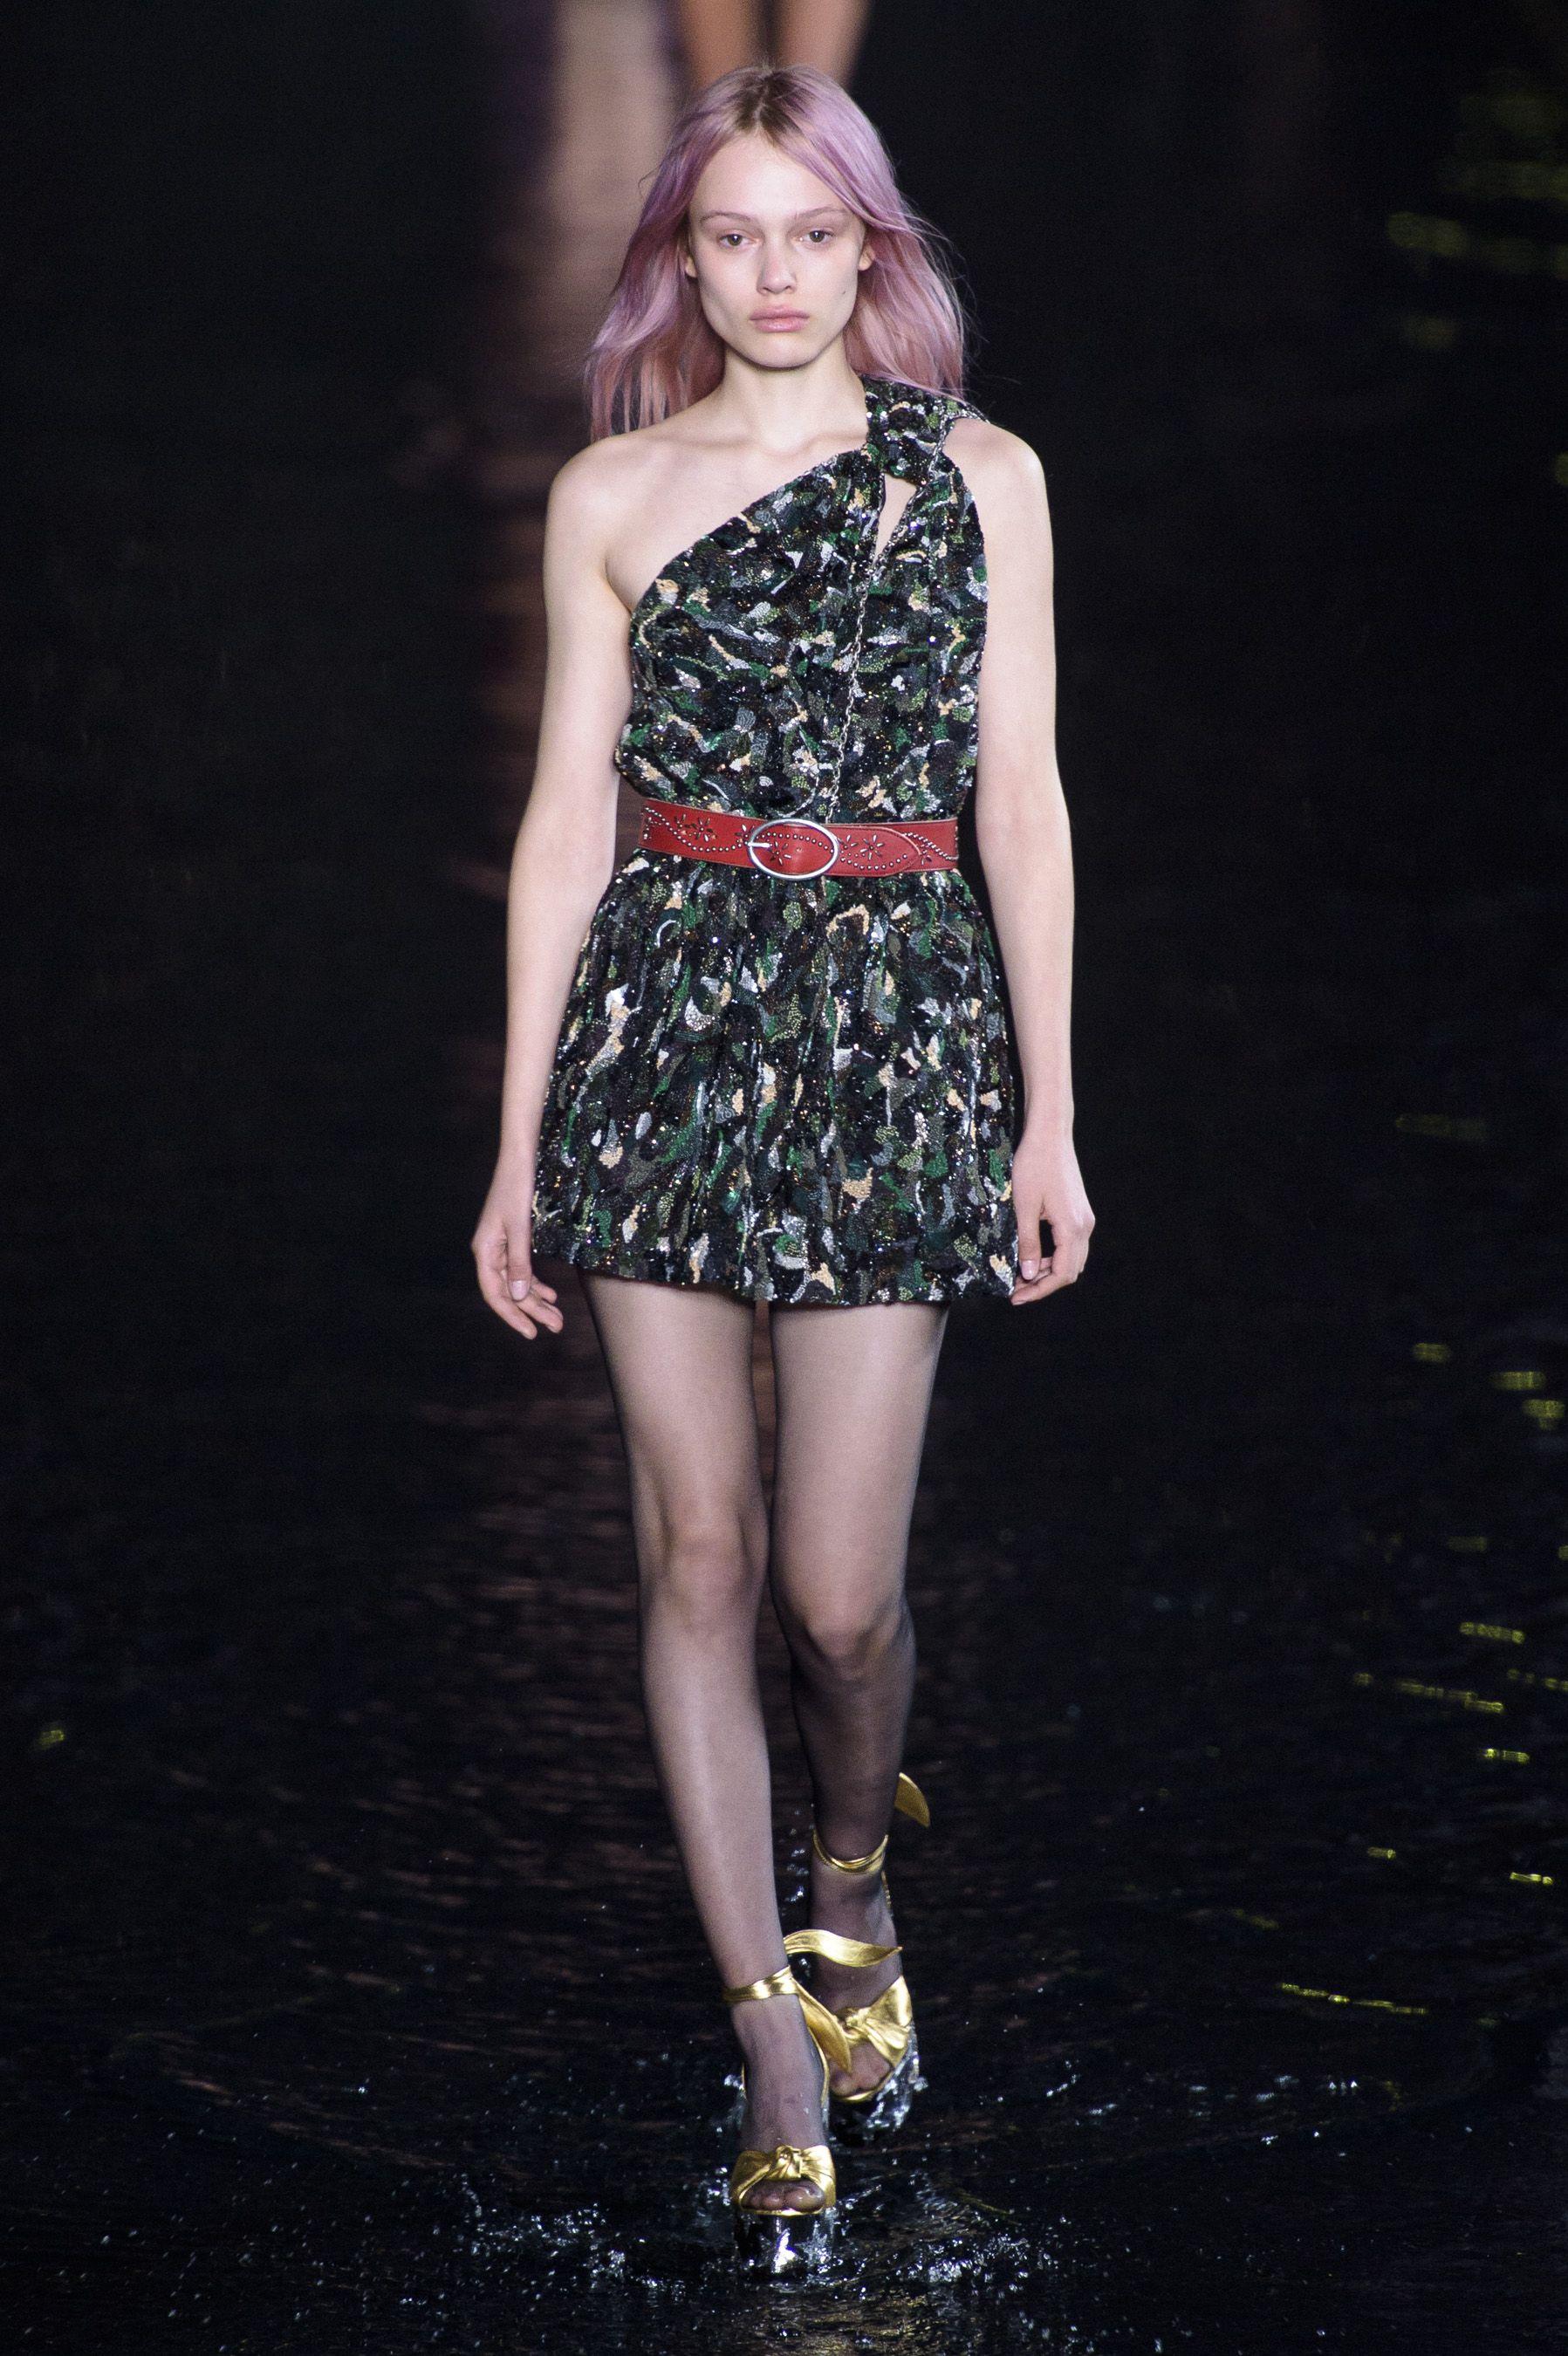 21fe6f2e742 95 Looks From Saint Laurent Spring Summer 2019 MYFW Show – Saint Laurent  Runway at Paris Fashion Week